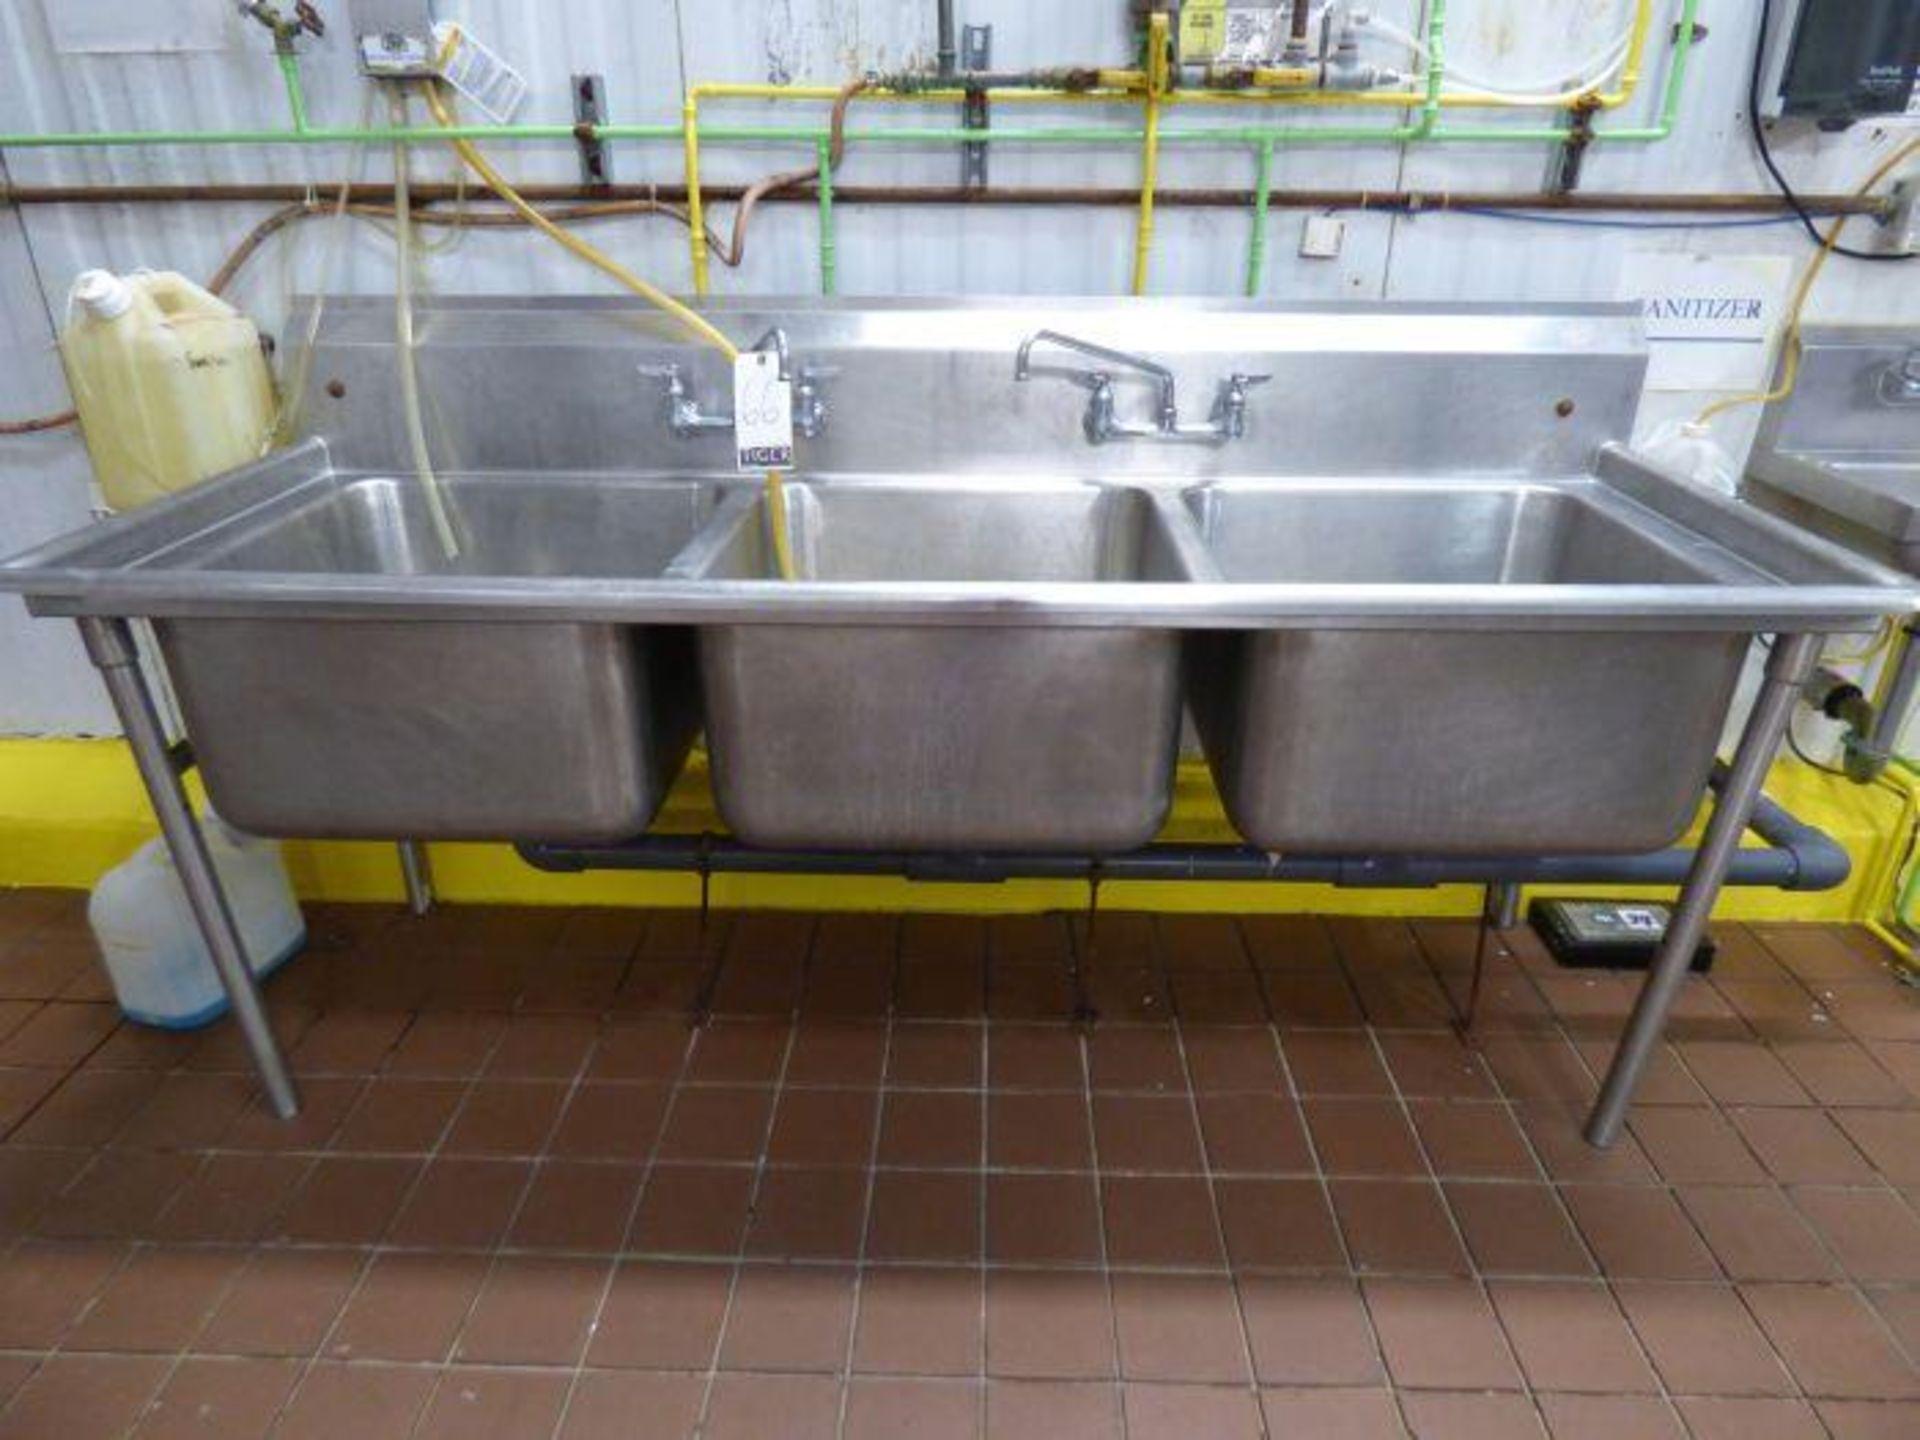 Lot 1066 - Lot Stainless Steel Sinks